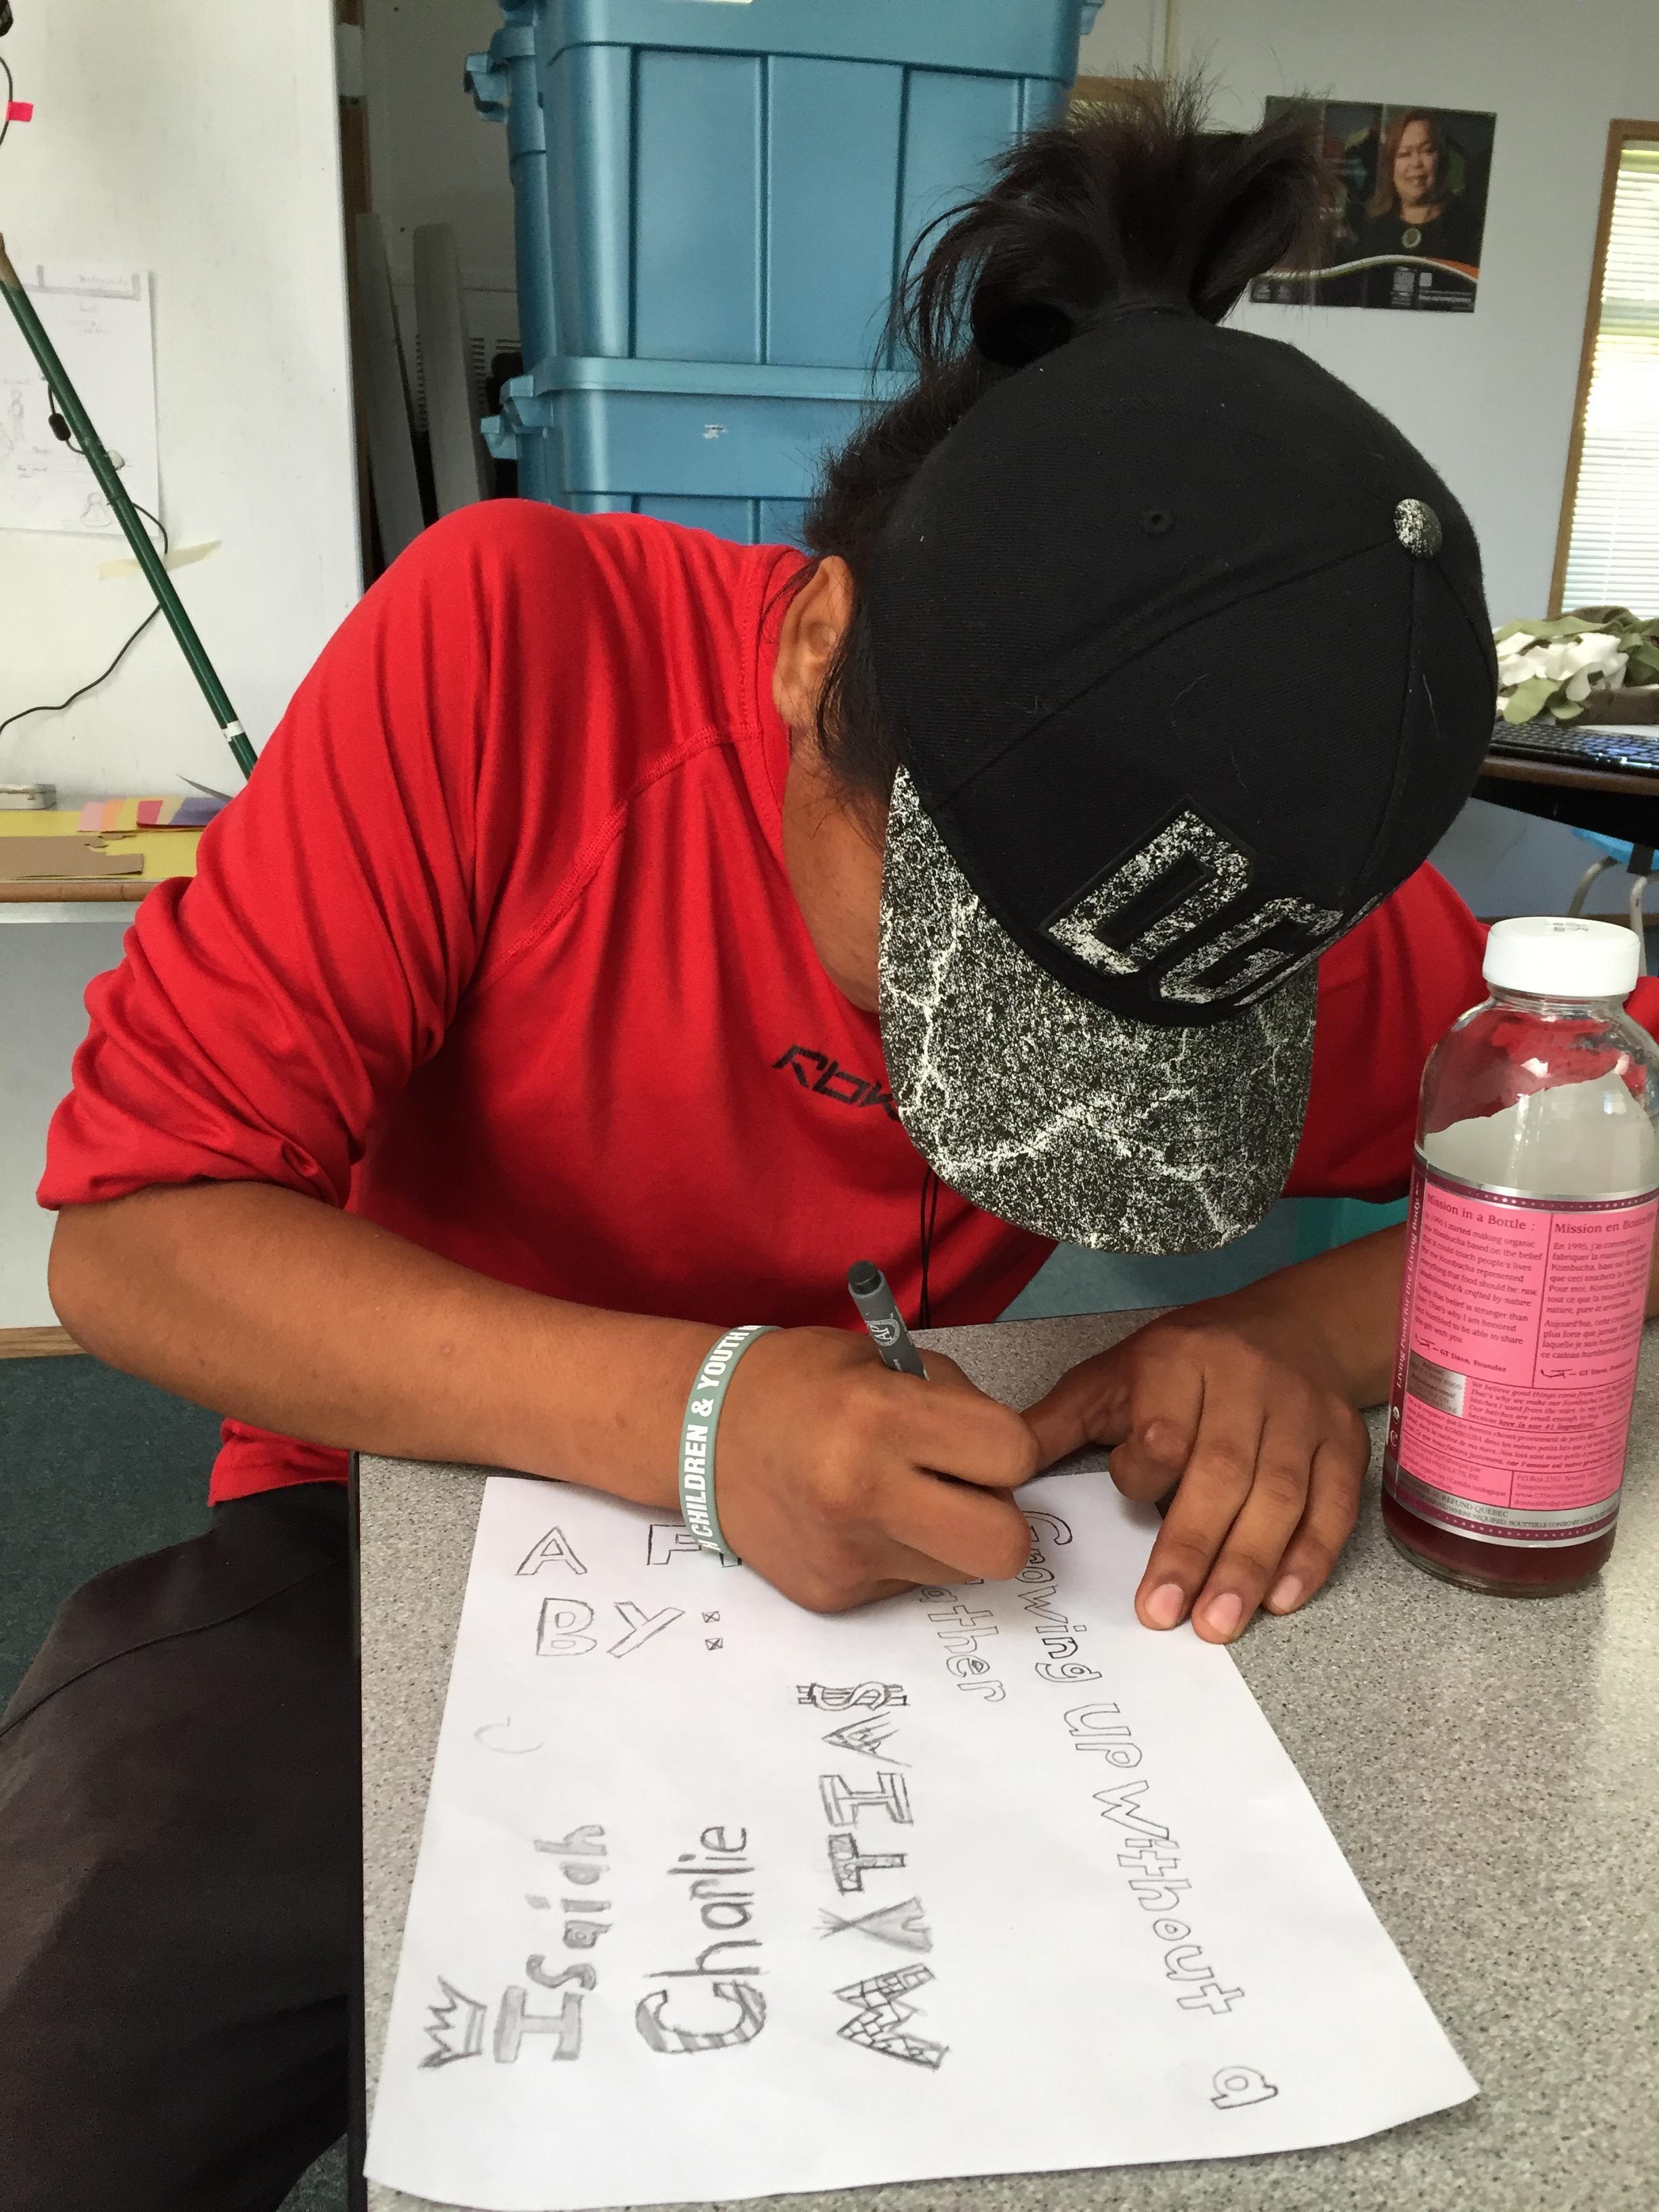 Isaiah creates the artwork for his credits.